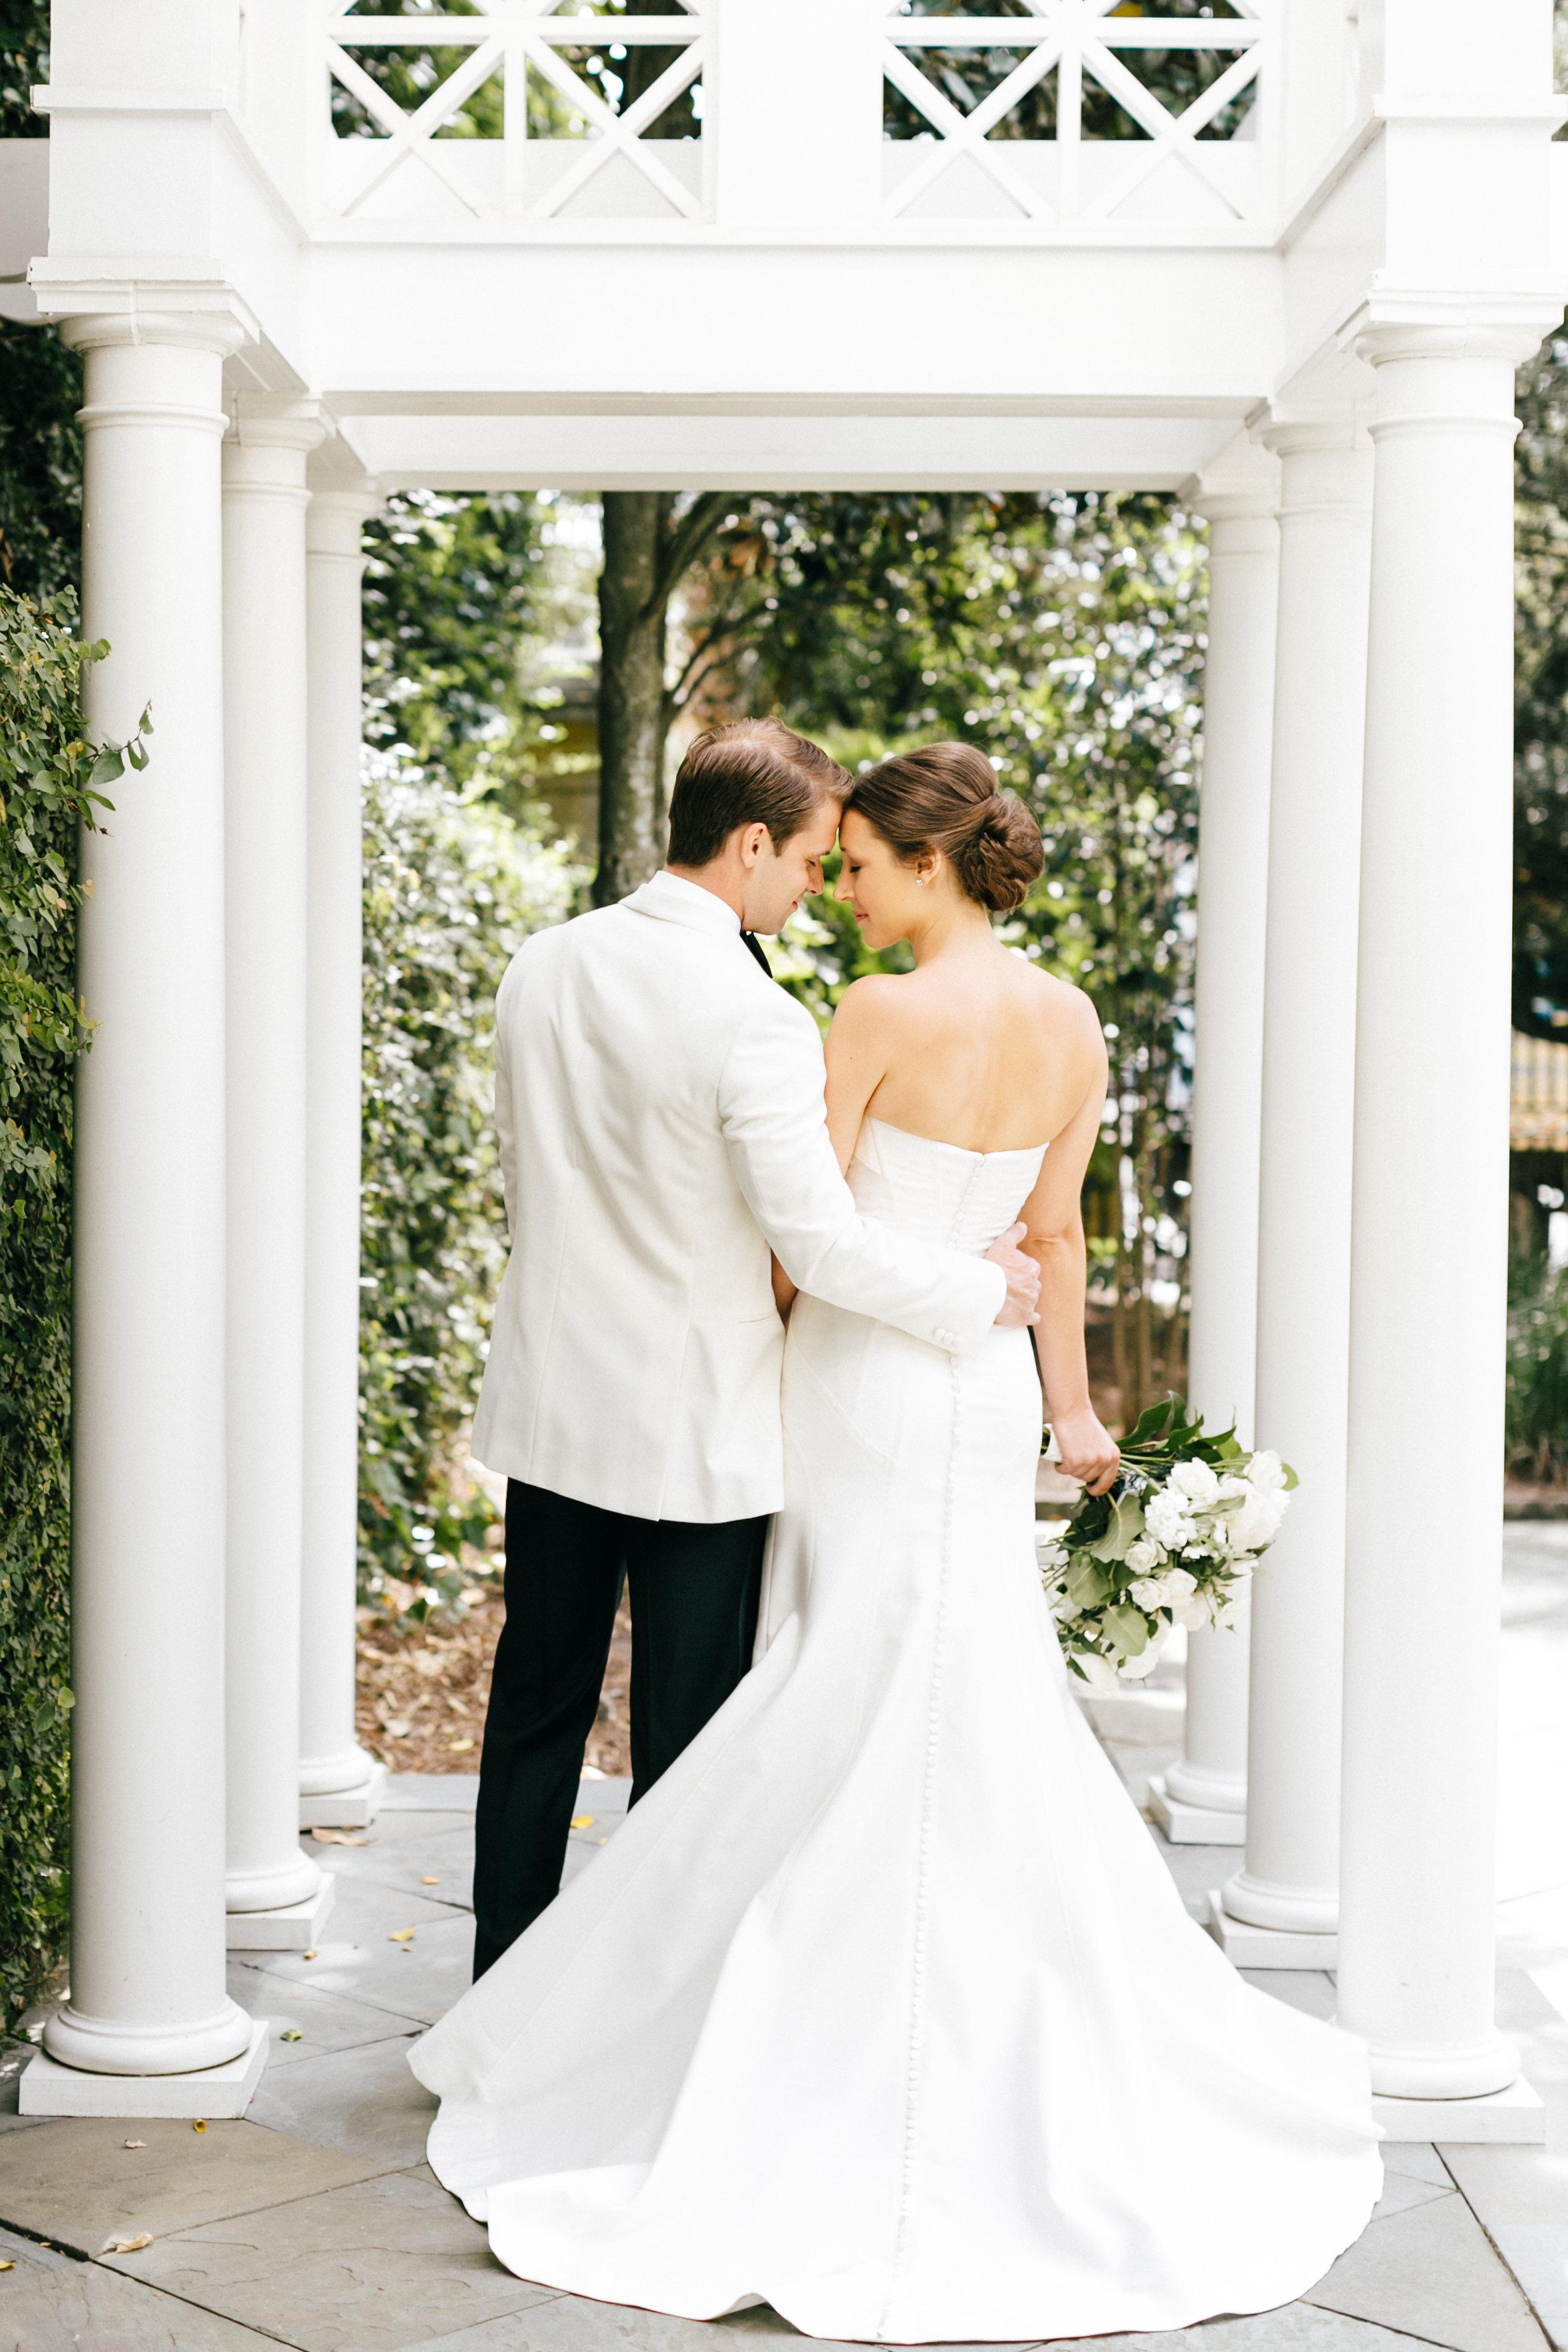 doloughty-wedding-249.jpg